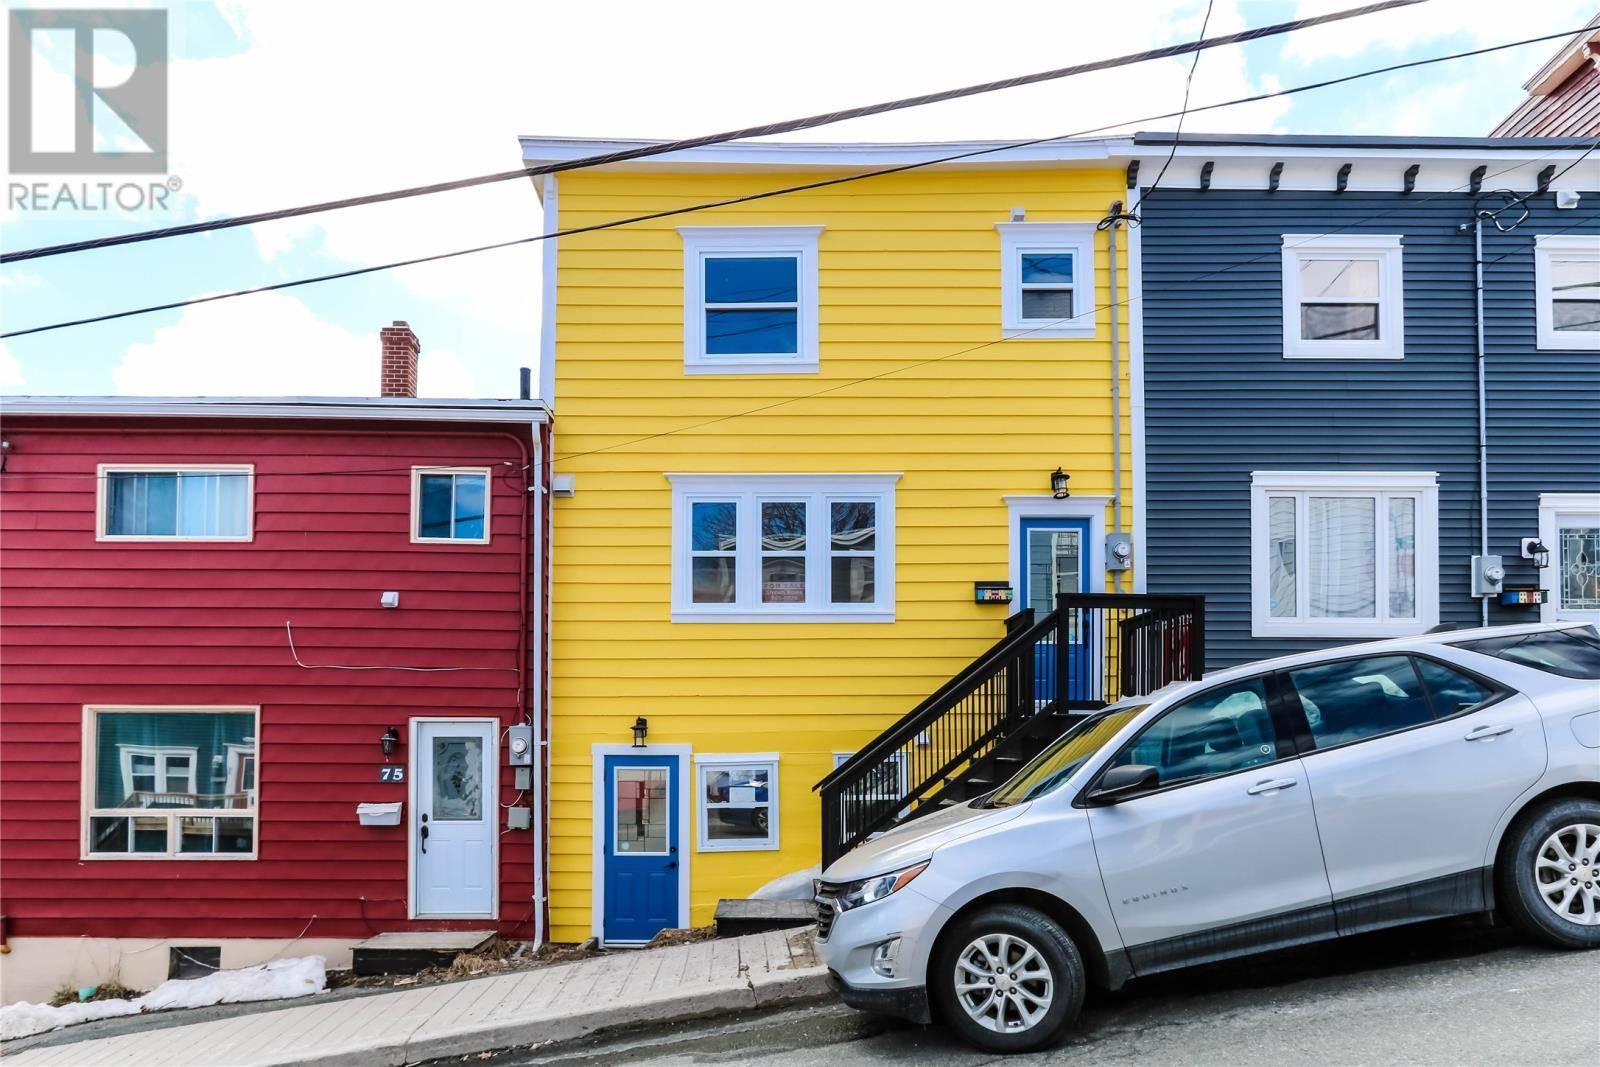 House for sale at 77 Flower Hl St. John's Newfoundland - MLS: 1209527